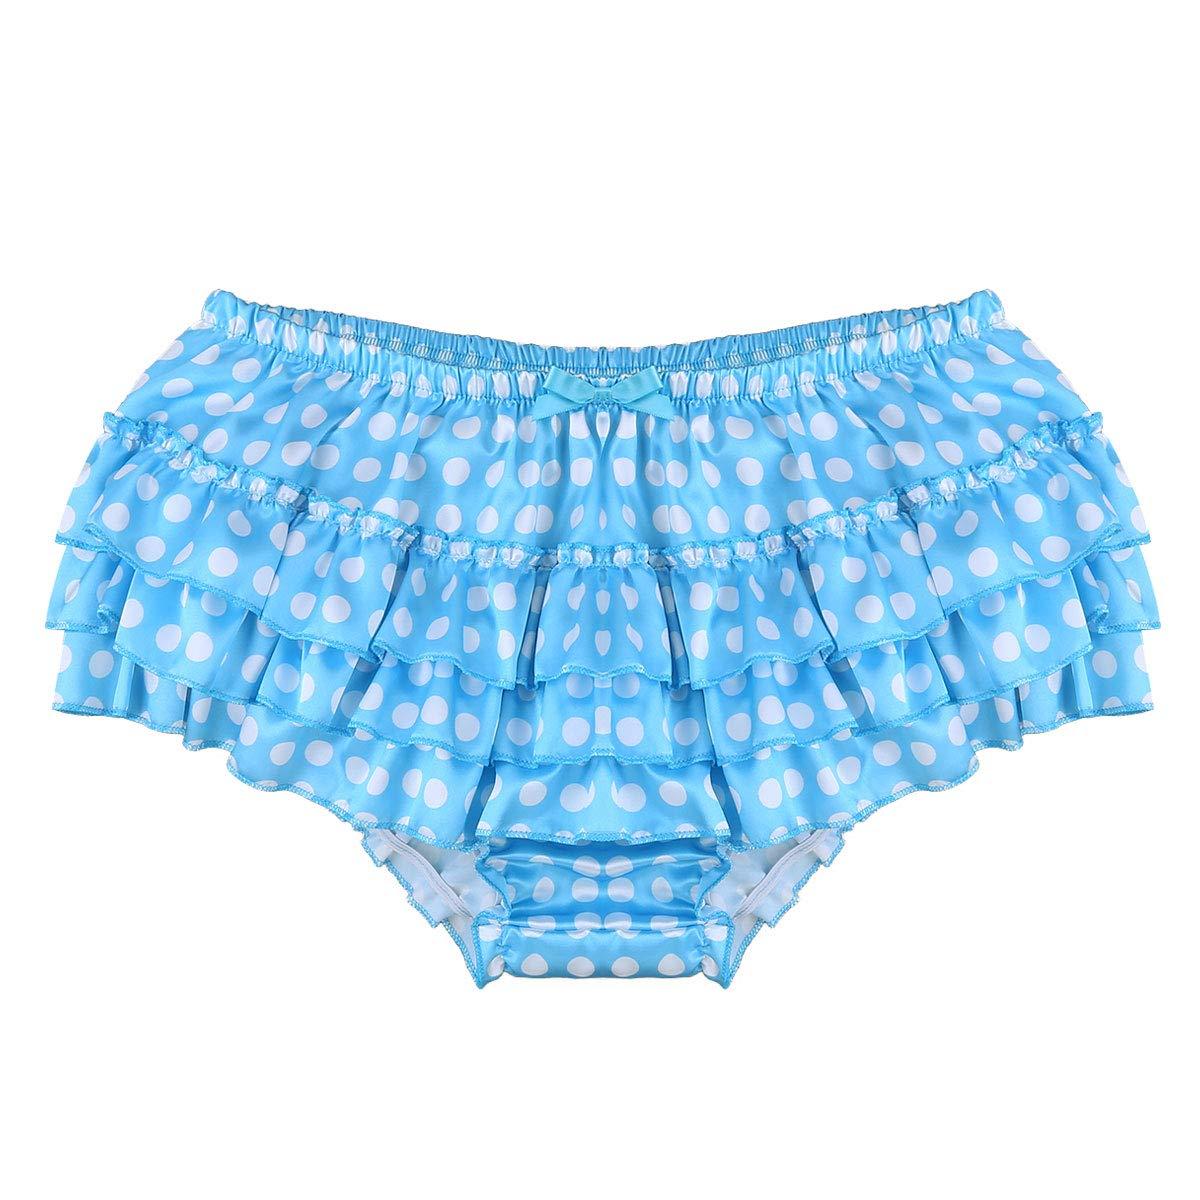 f36bdba7b iiniim Mens Sexy Lingerie Satin Ruffle Skirted Sissy Panties Briefs  Underwear